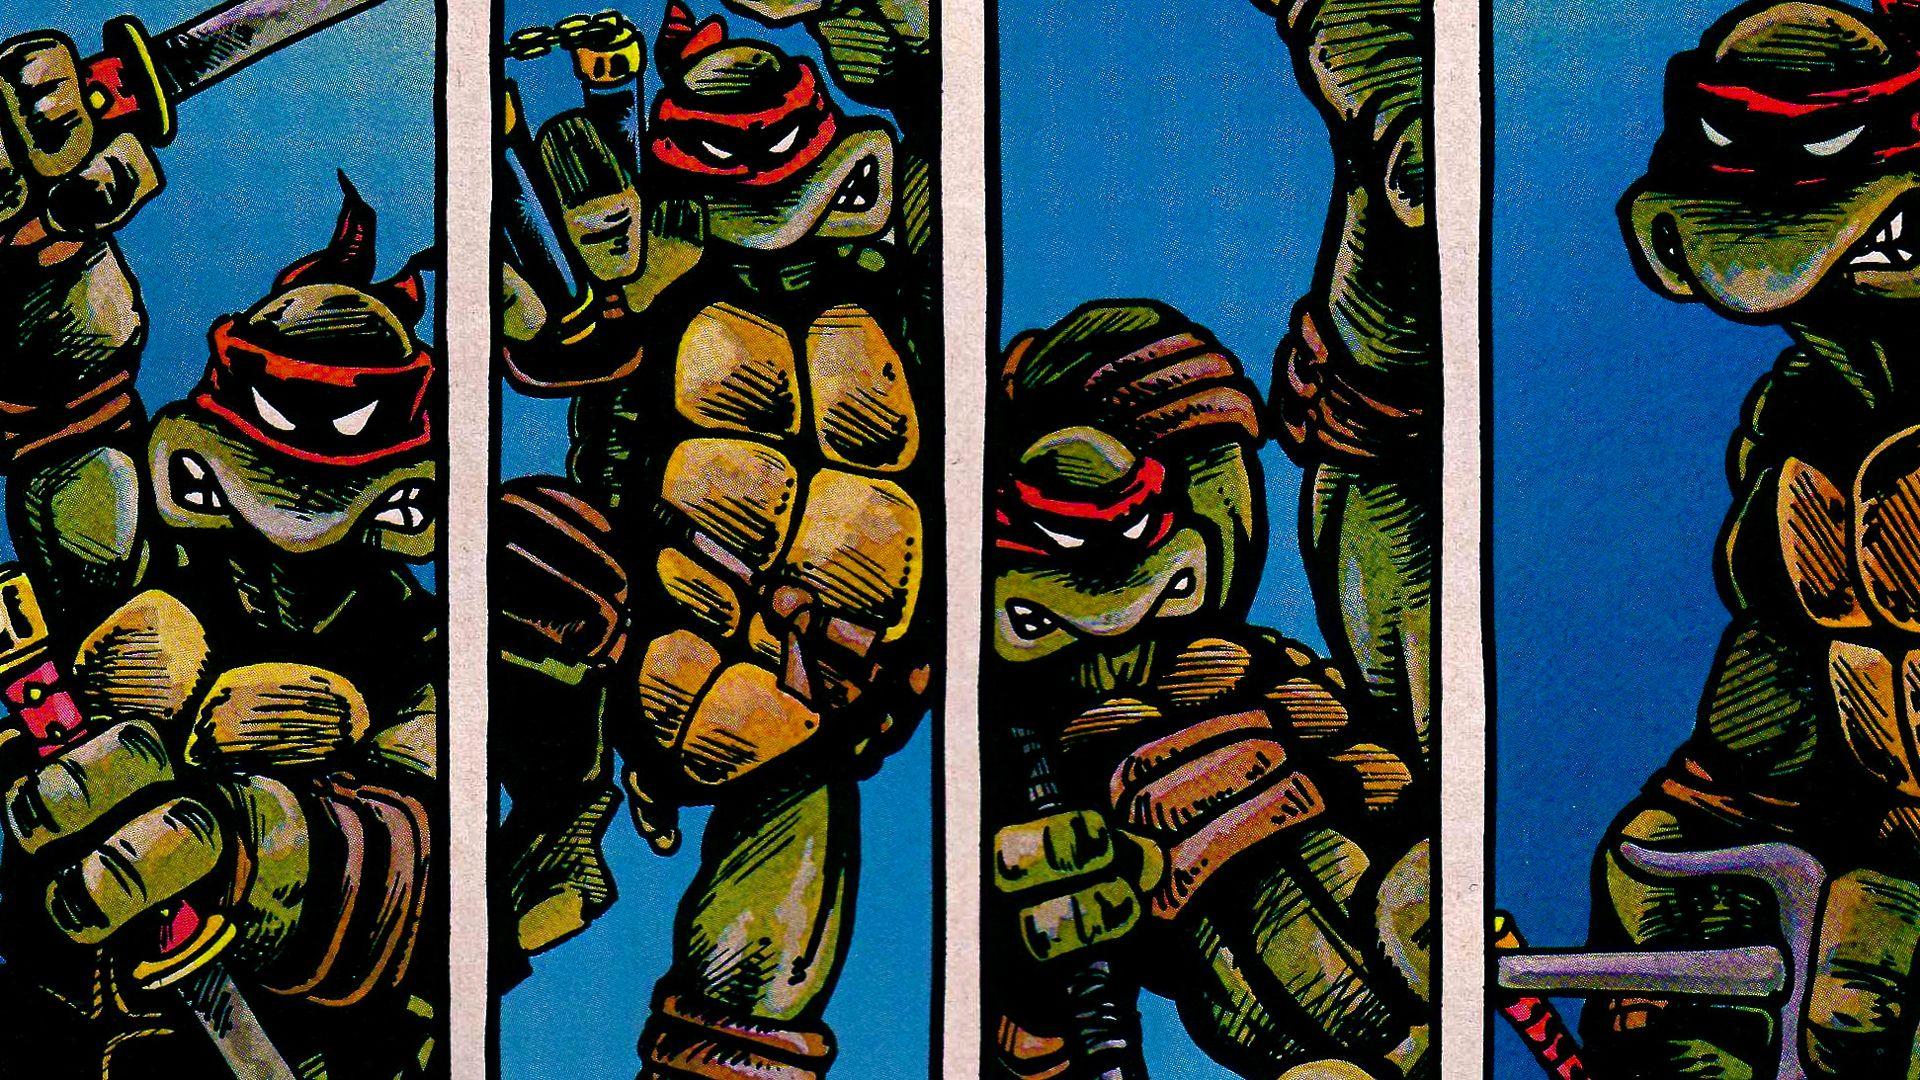 Teenage mutant ninja turtles comic wallpaper - photo#37